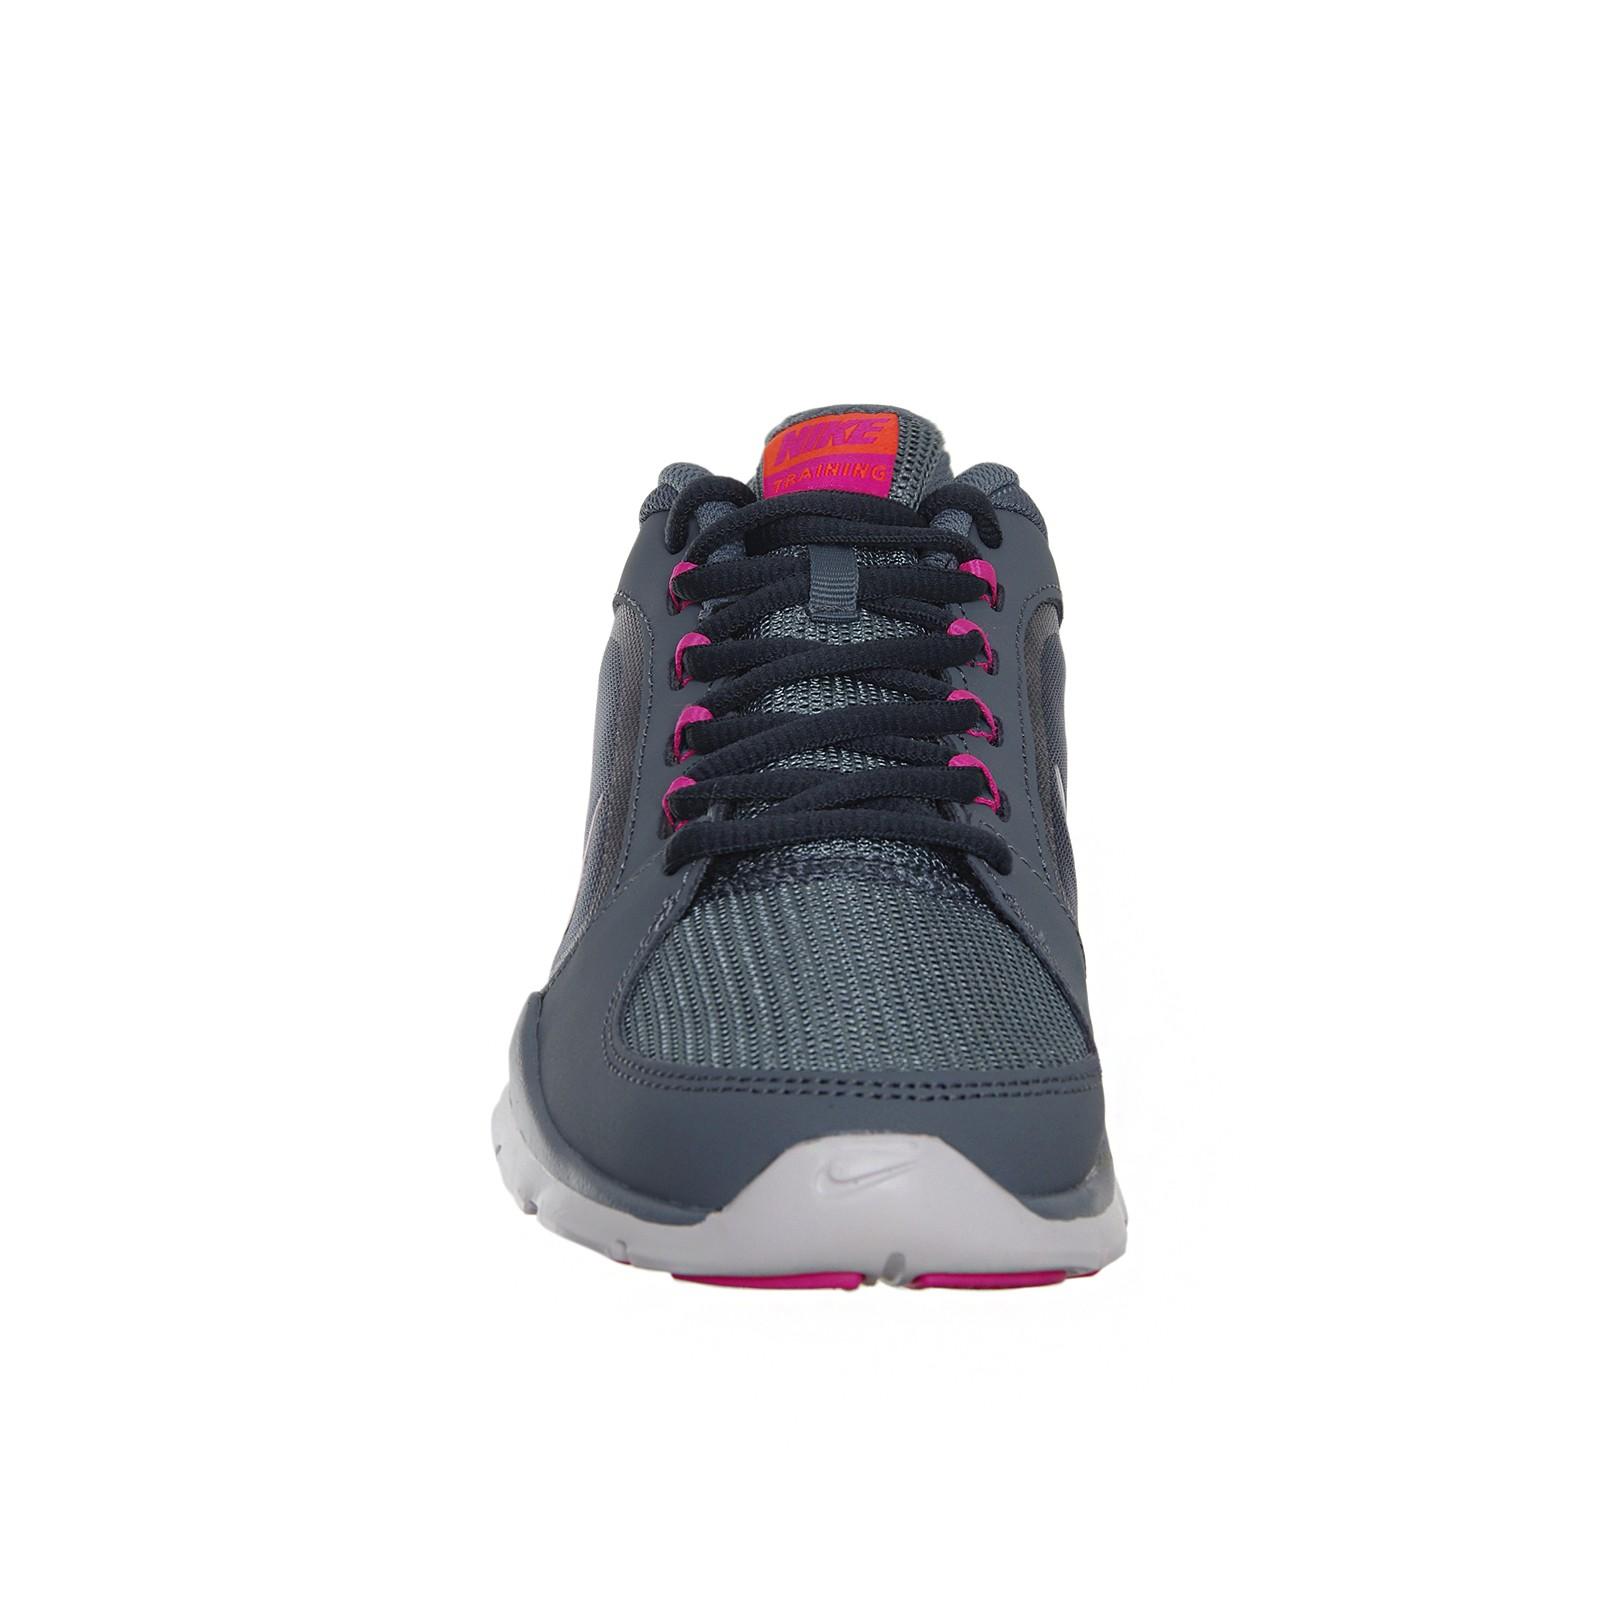 98566e8224312 sneakers training Nike wmns nike flex trainer 4 - Маратонки - Обувки ...